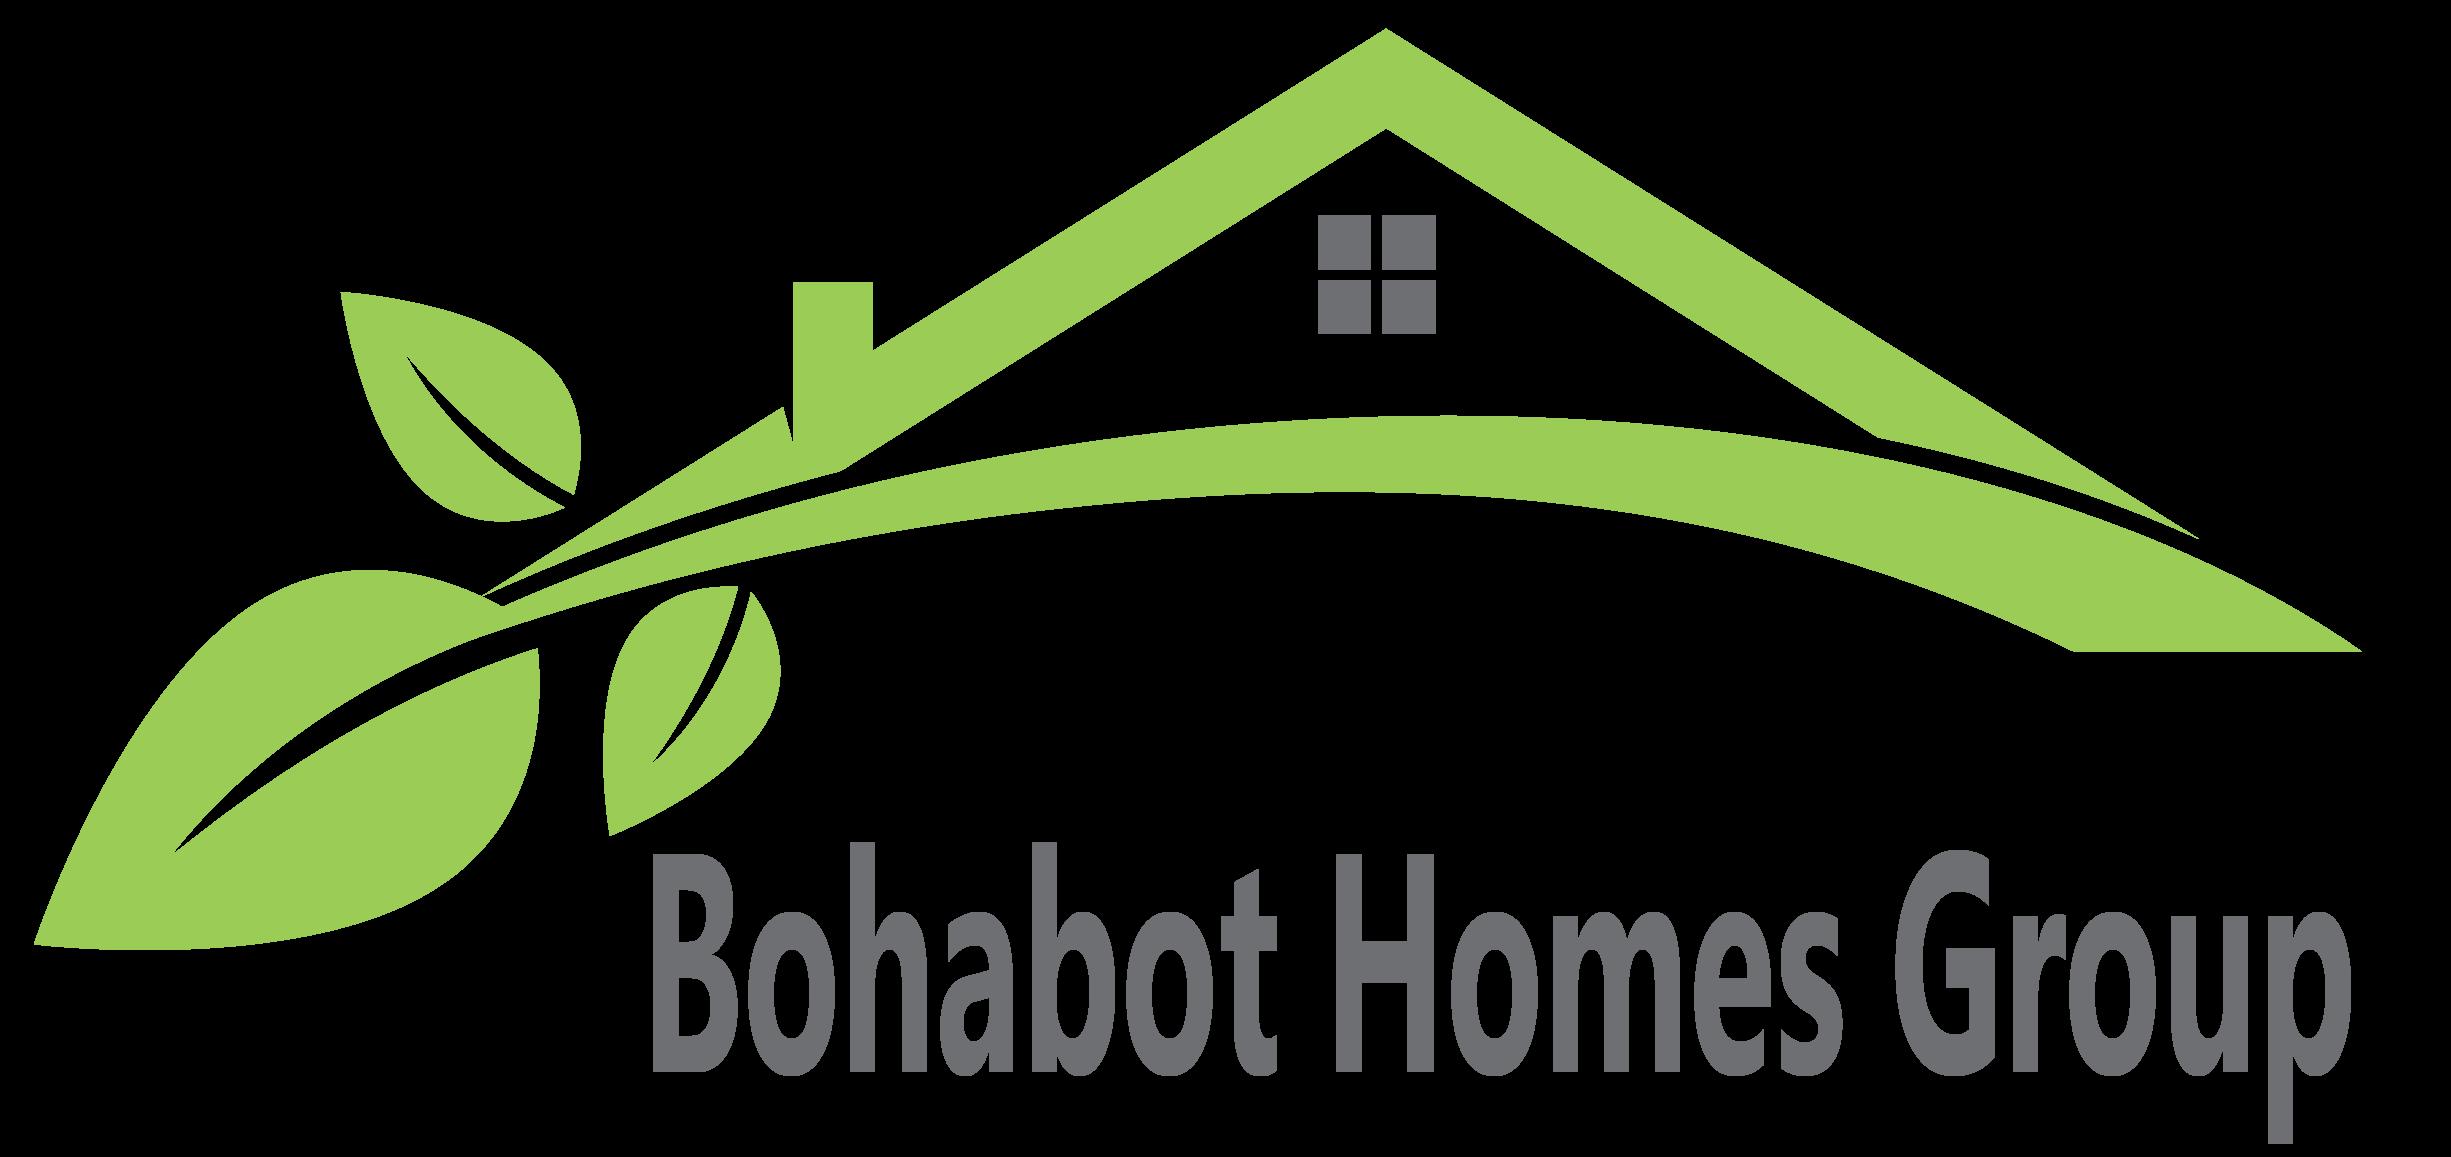 Bohabot Homes Group Logo copy.png